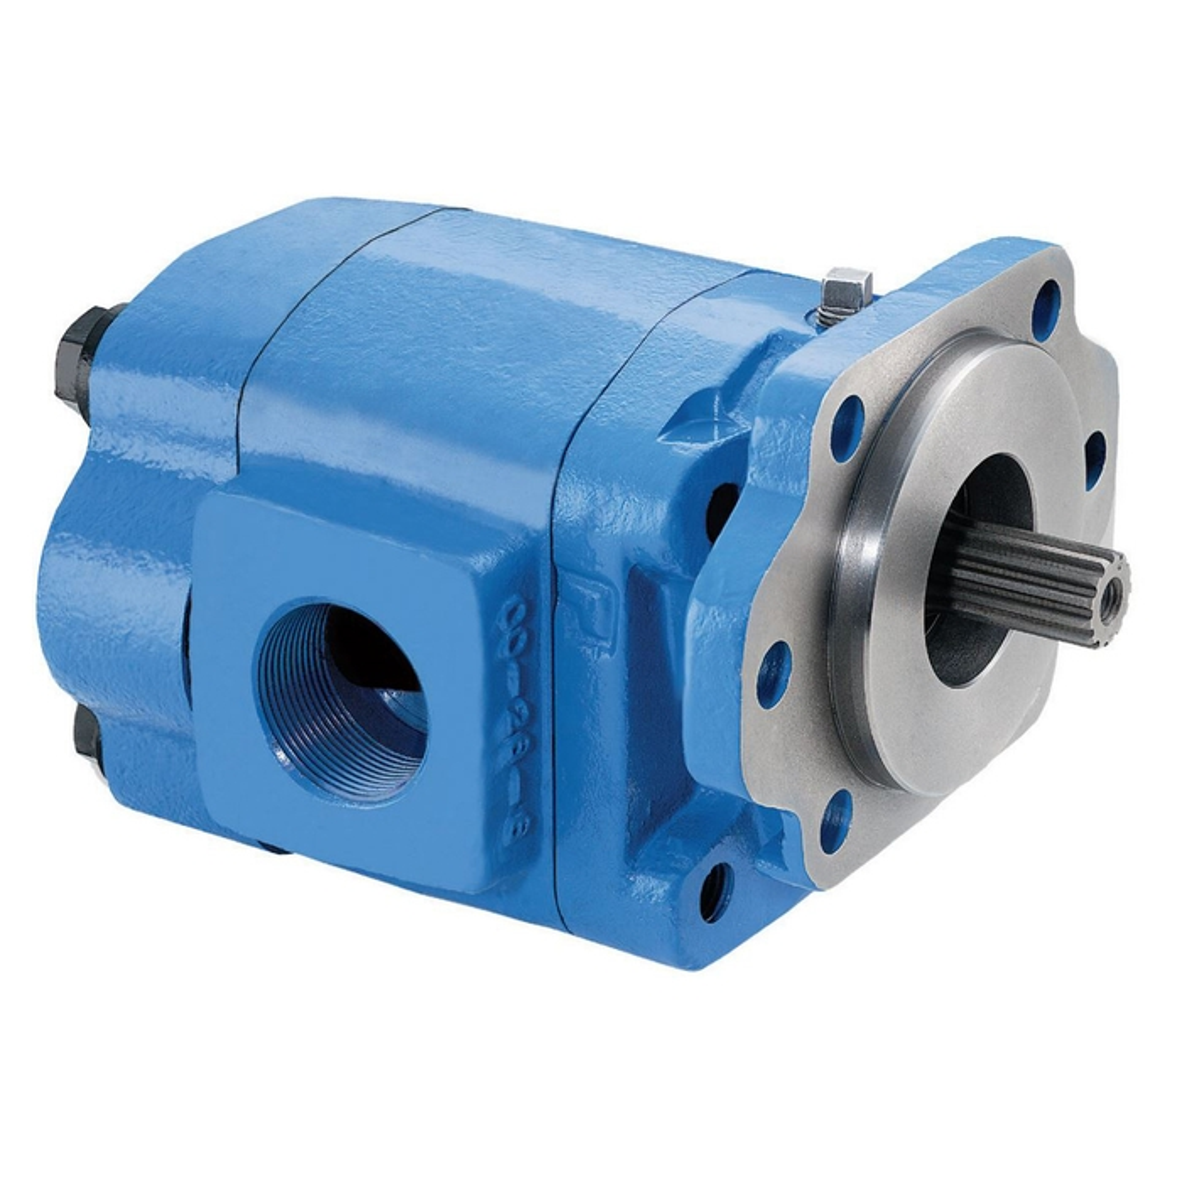 Permco 5151 Series Medium-Heavy Duty Pump